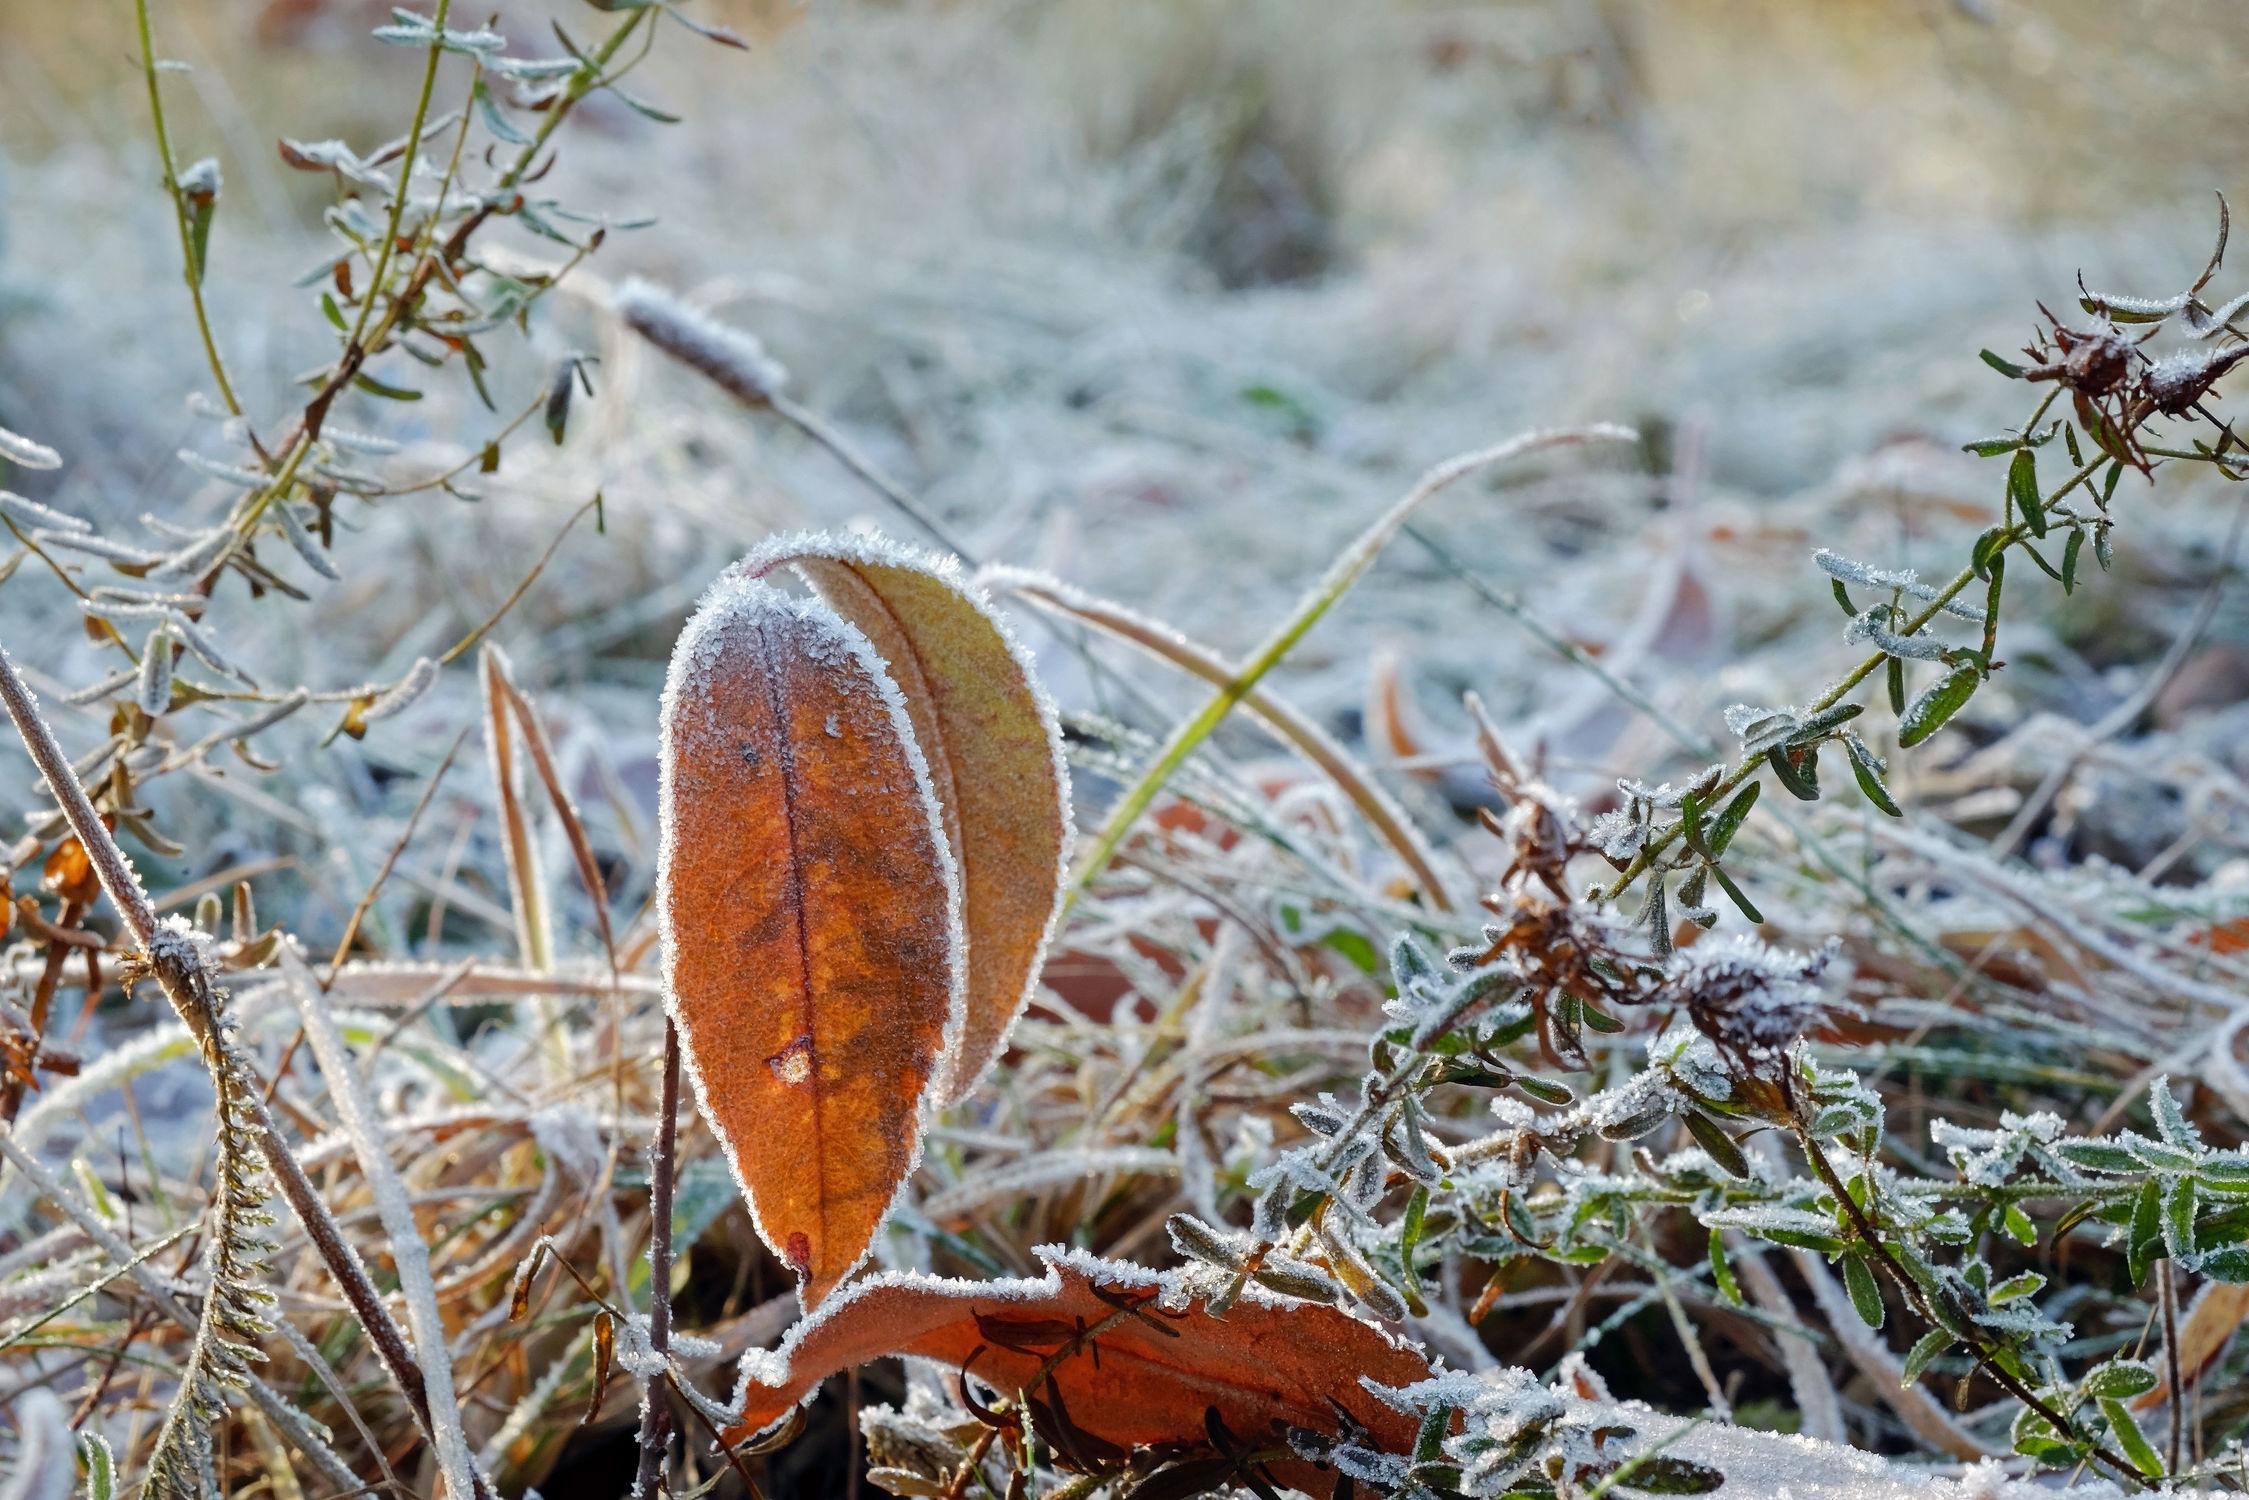 Bild mit Gräser, Winter, Eis, Gras, Blatt, Felder, Kälte, Frost, Wiesen, Wandern, Wandern, Rauhreif, Raureif, Morgenstunde